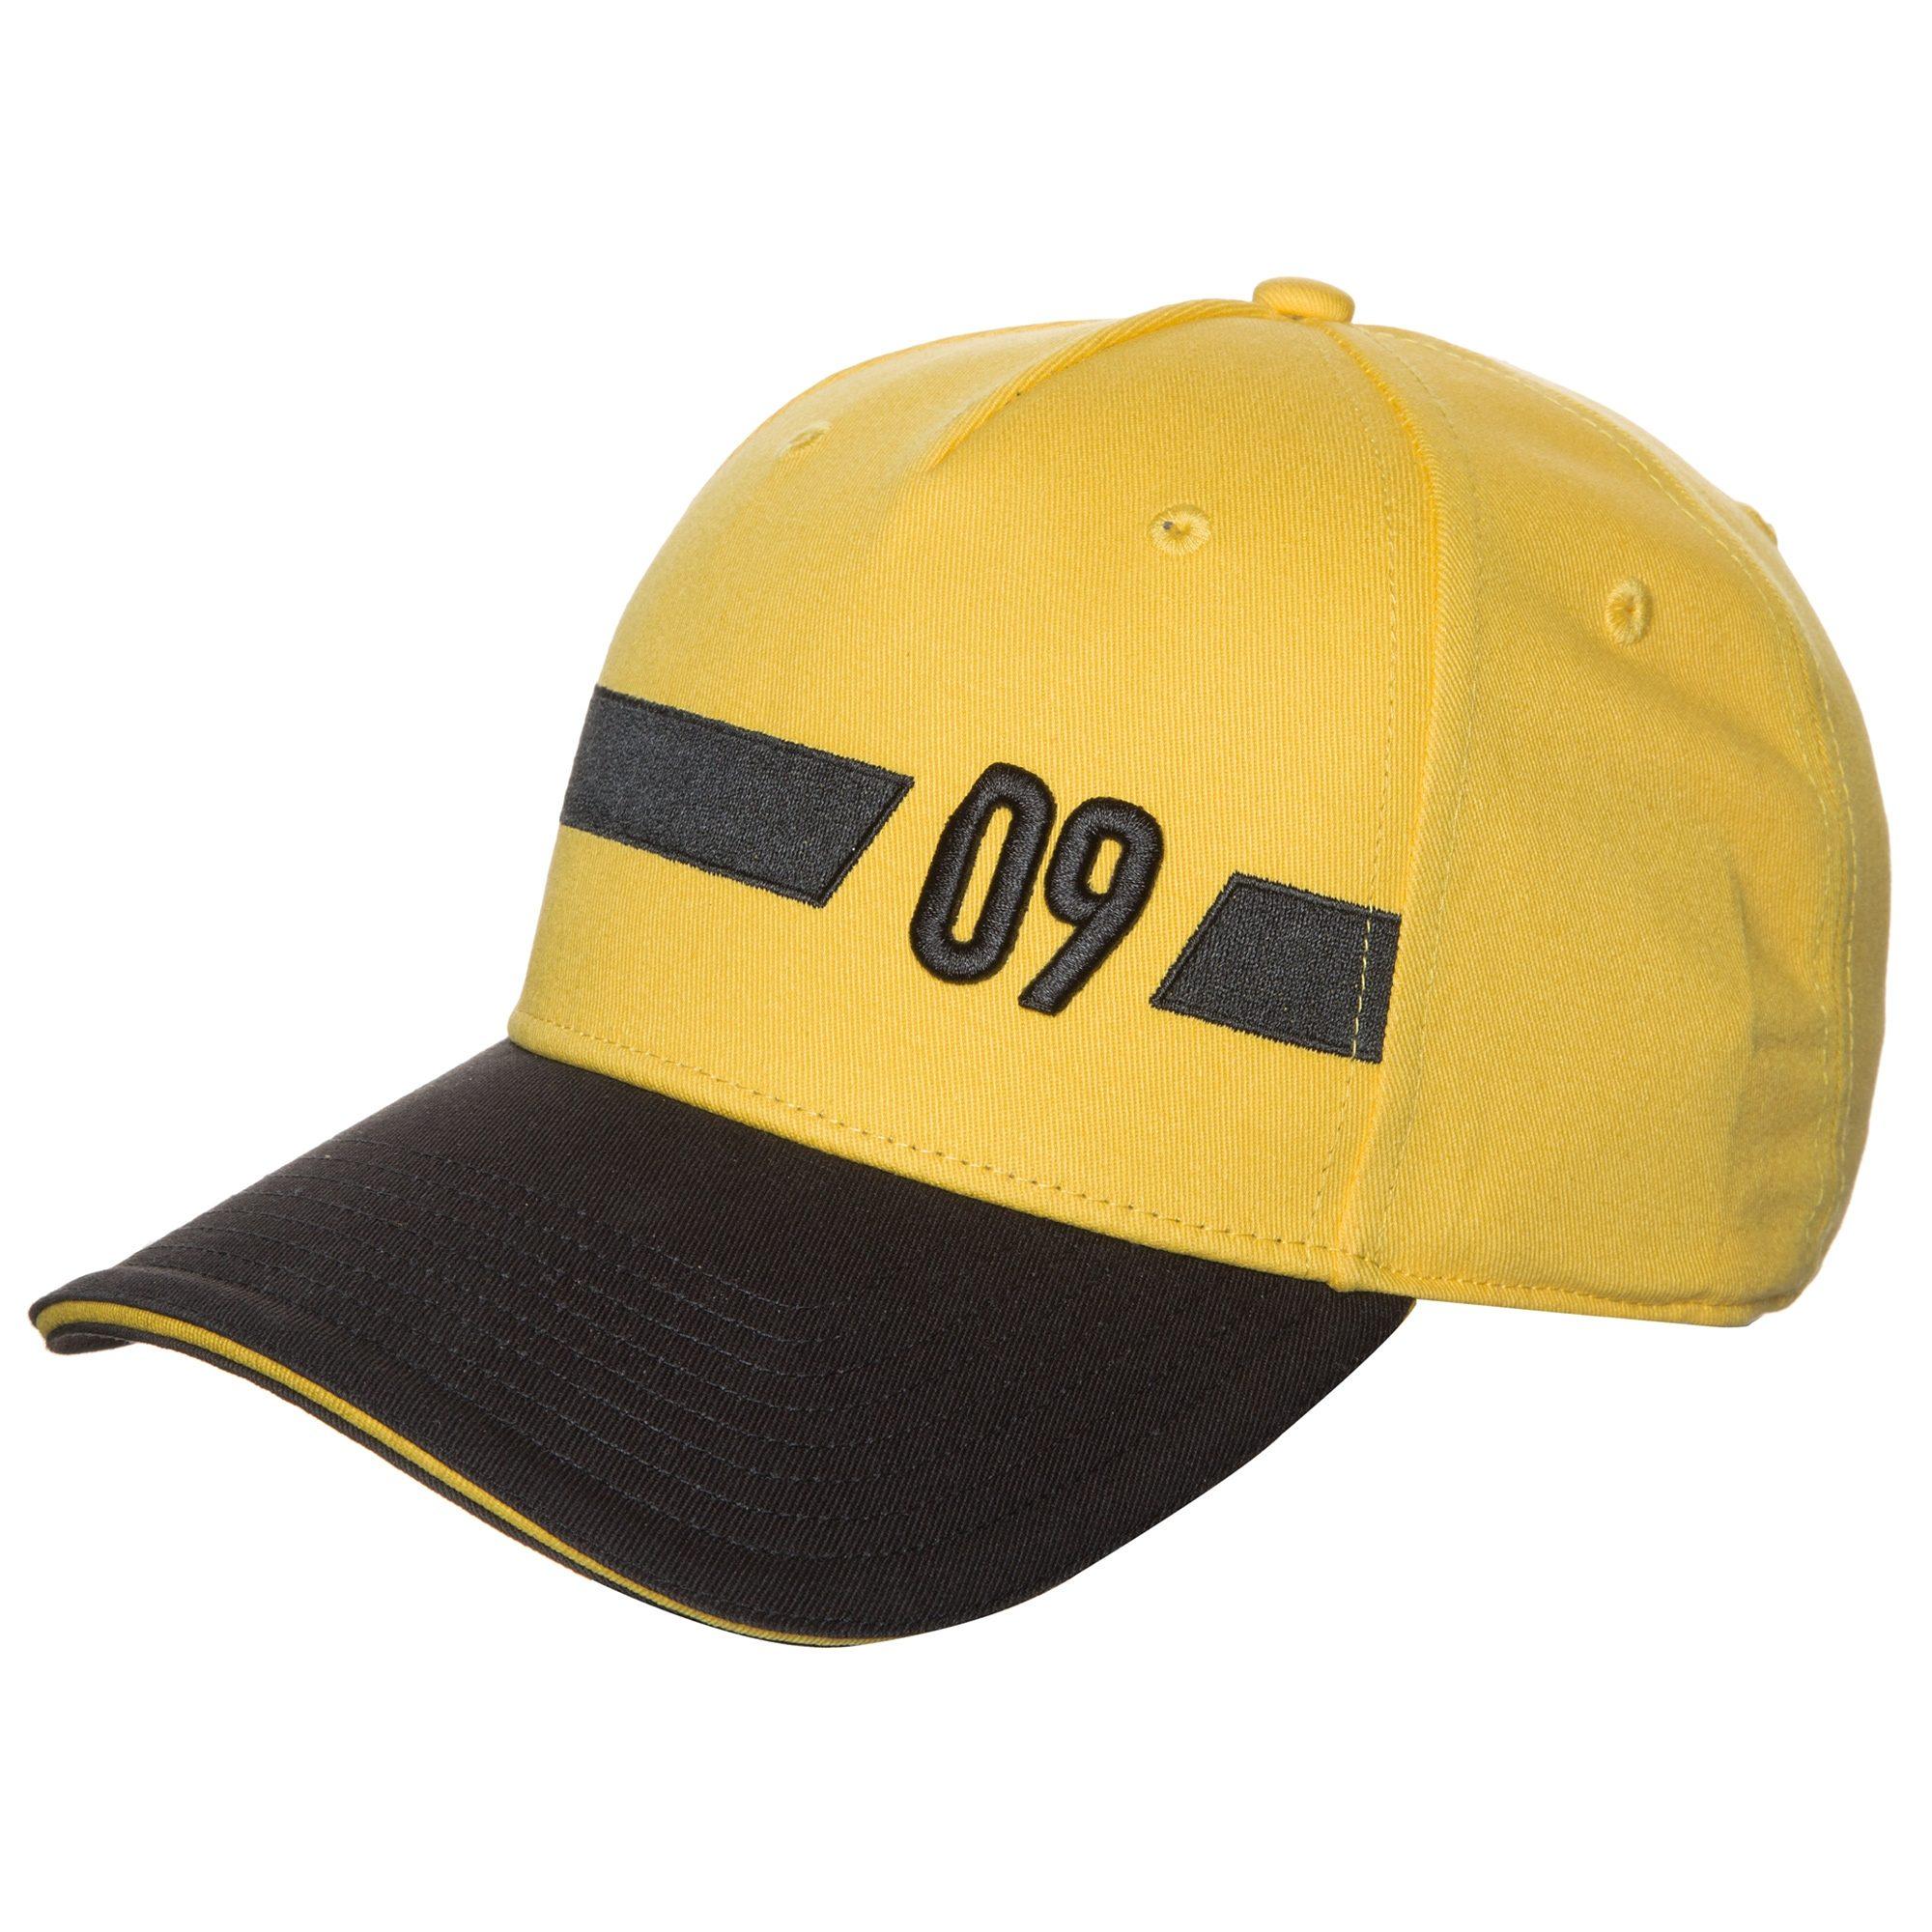 PUMA Borussia Dortmund Cap